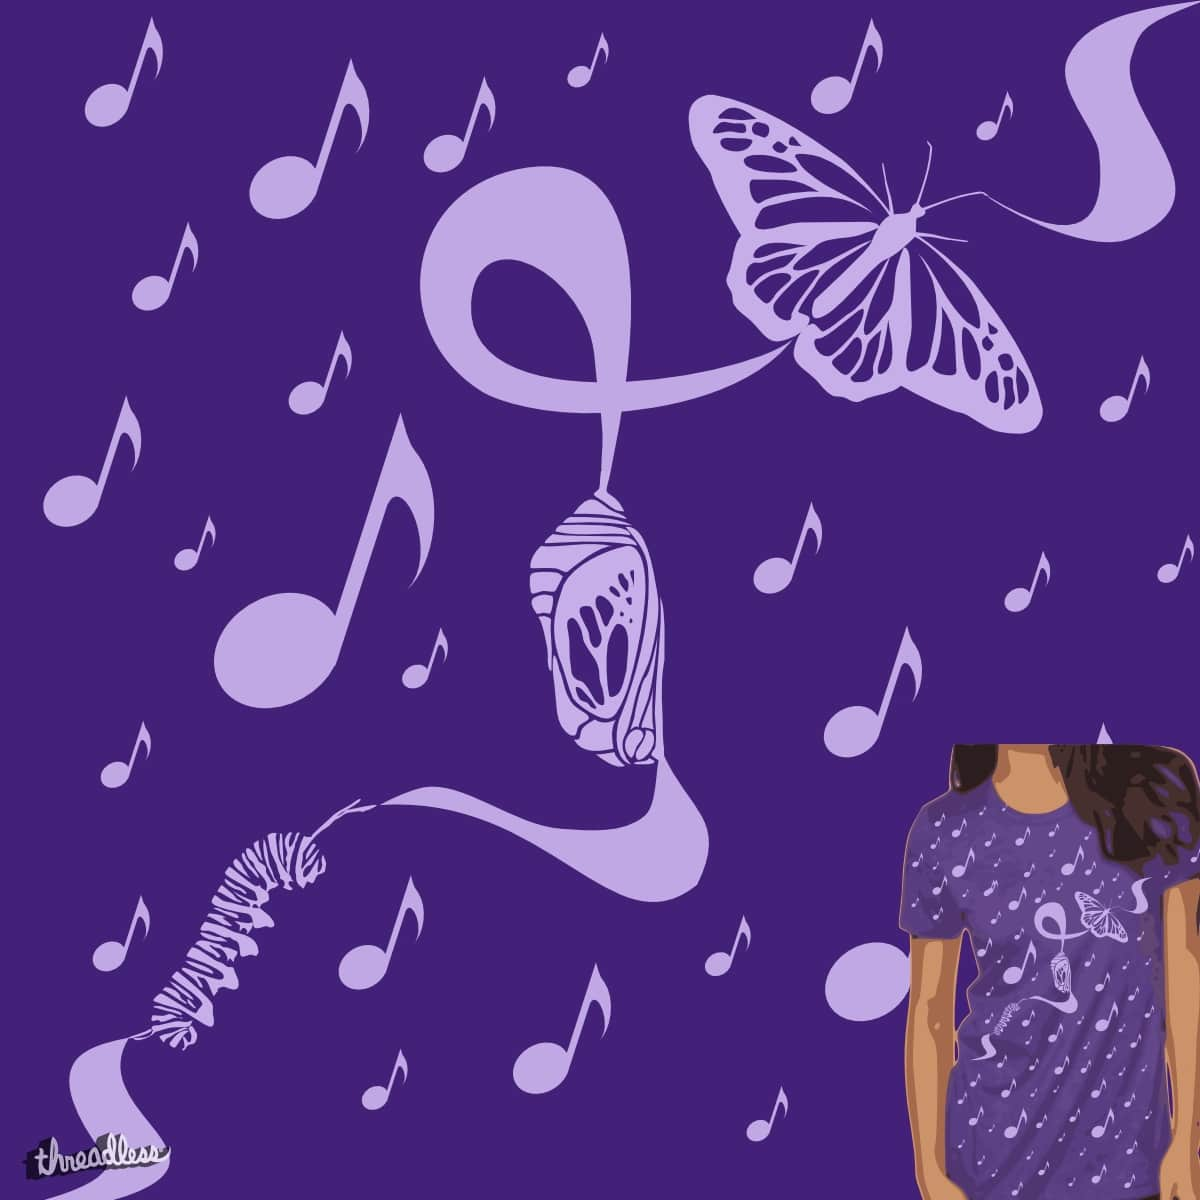 Music Metamorphisis by TRYBYK on Threadless